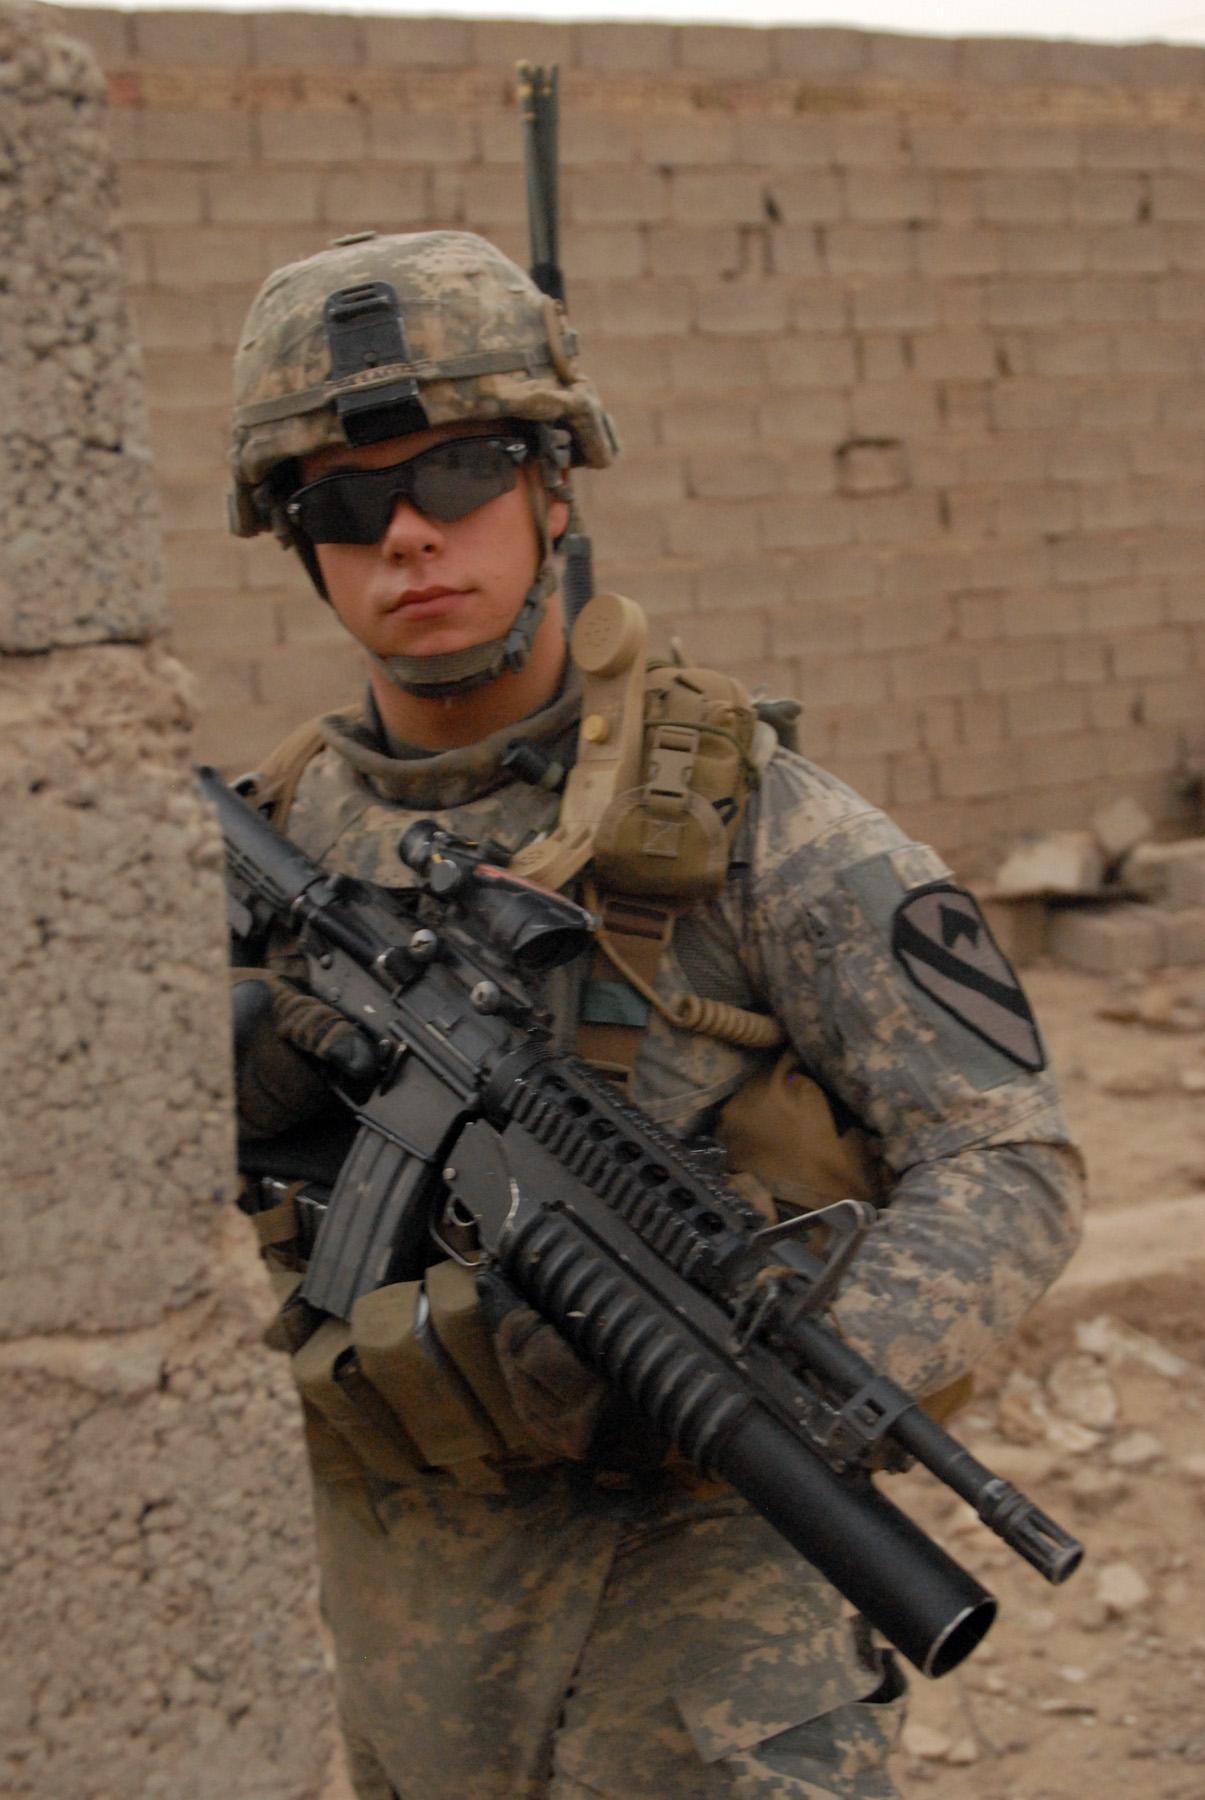 File:US Army 51059 BAGHDAD - Pfc. Dan Cesiastis, an infantryman ...